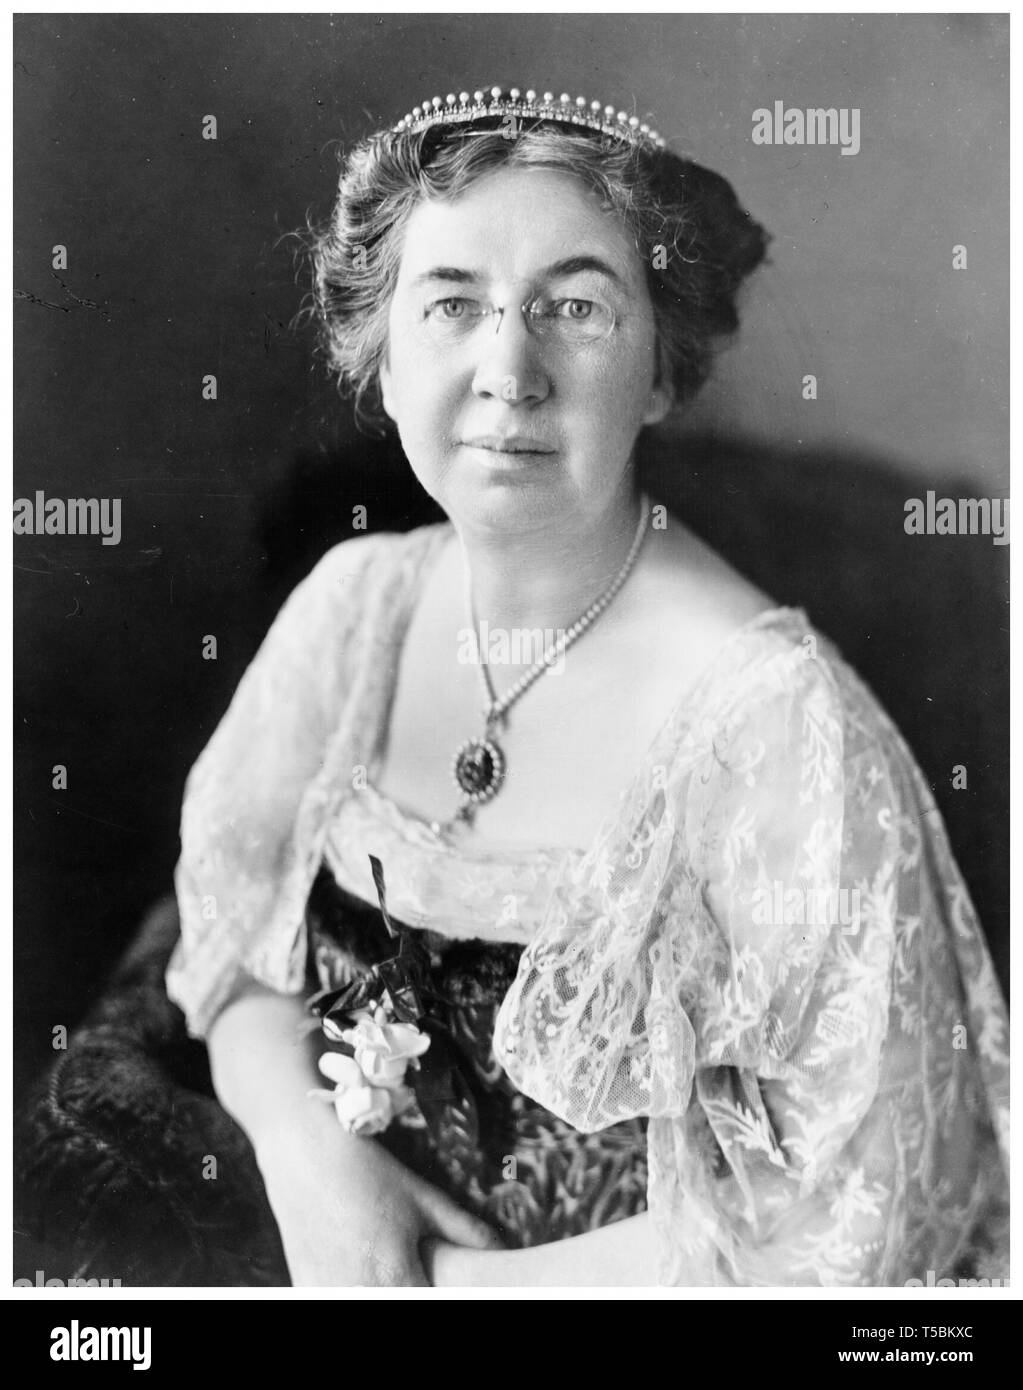 Mabel Gardiner Hubbard Bell (1857-1923), wife of inventor Alexander Graham Bell, portrait, by Harris & Ewing, c. 1917 Stock Photo